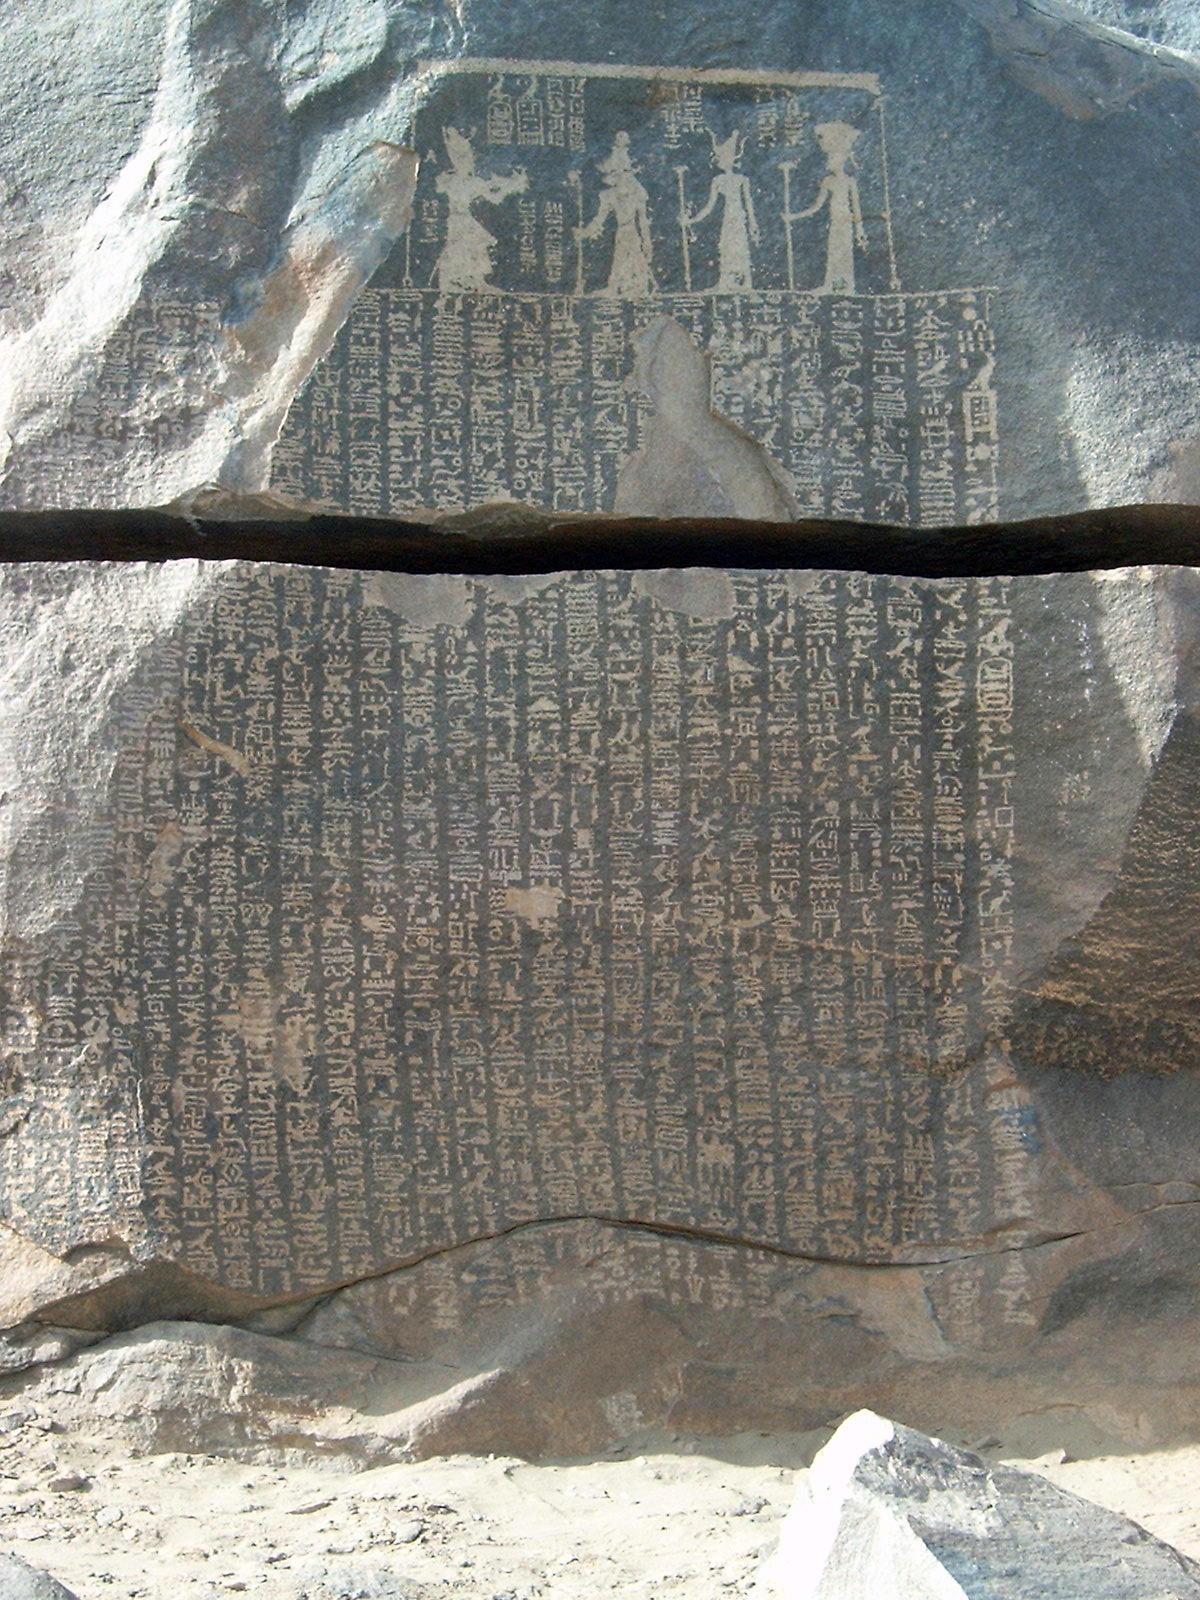 http://upload.wikimedia.org/wikipedia/commons/8/82/Famine_stela.jpg